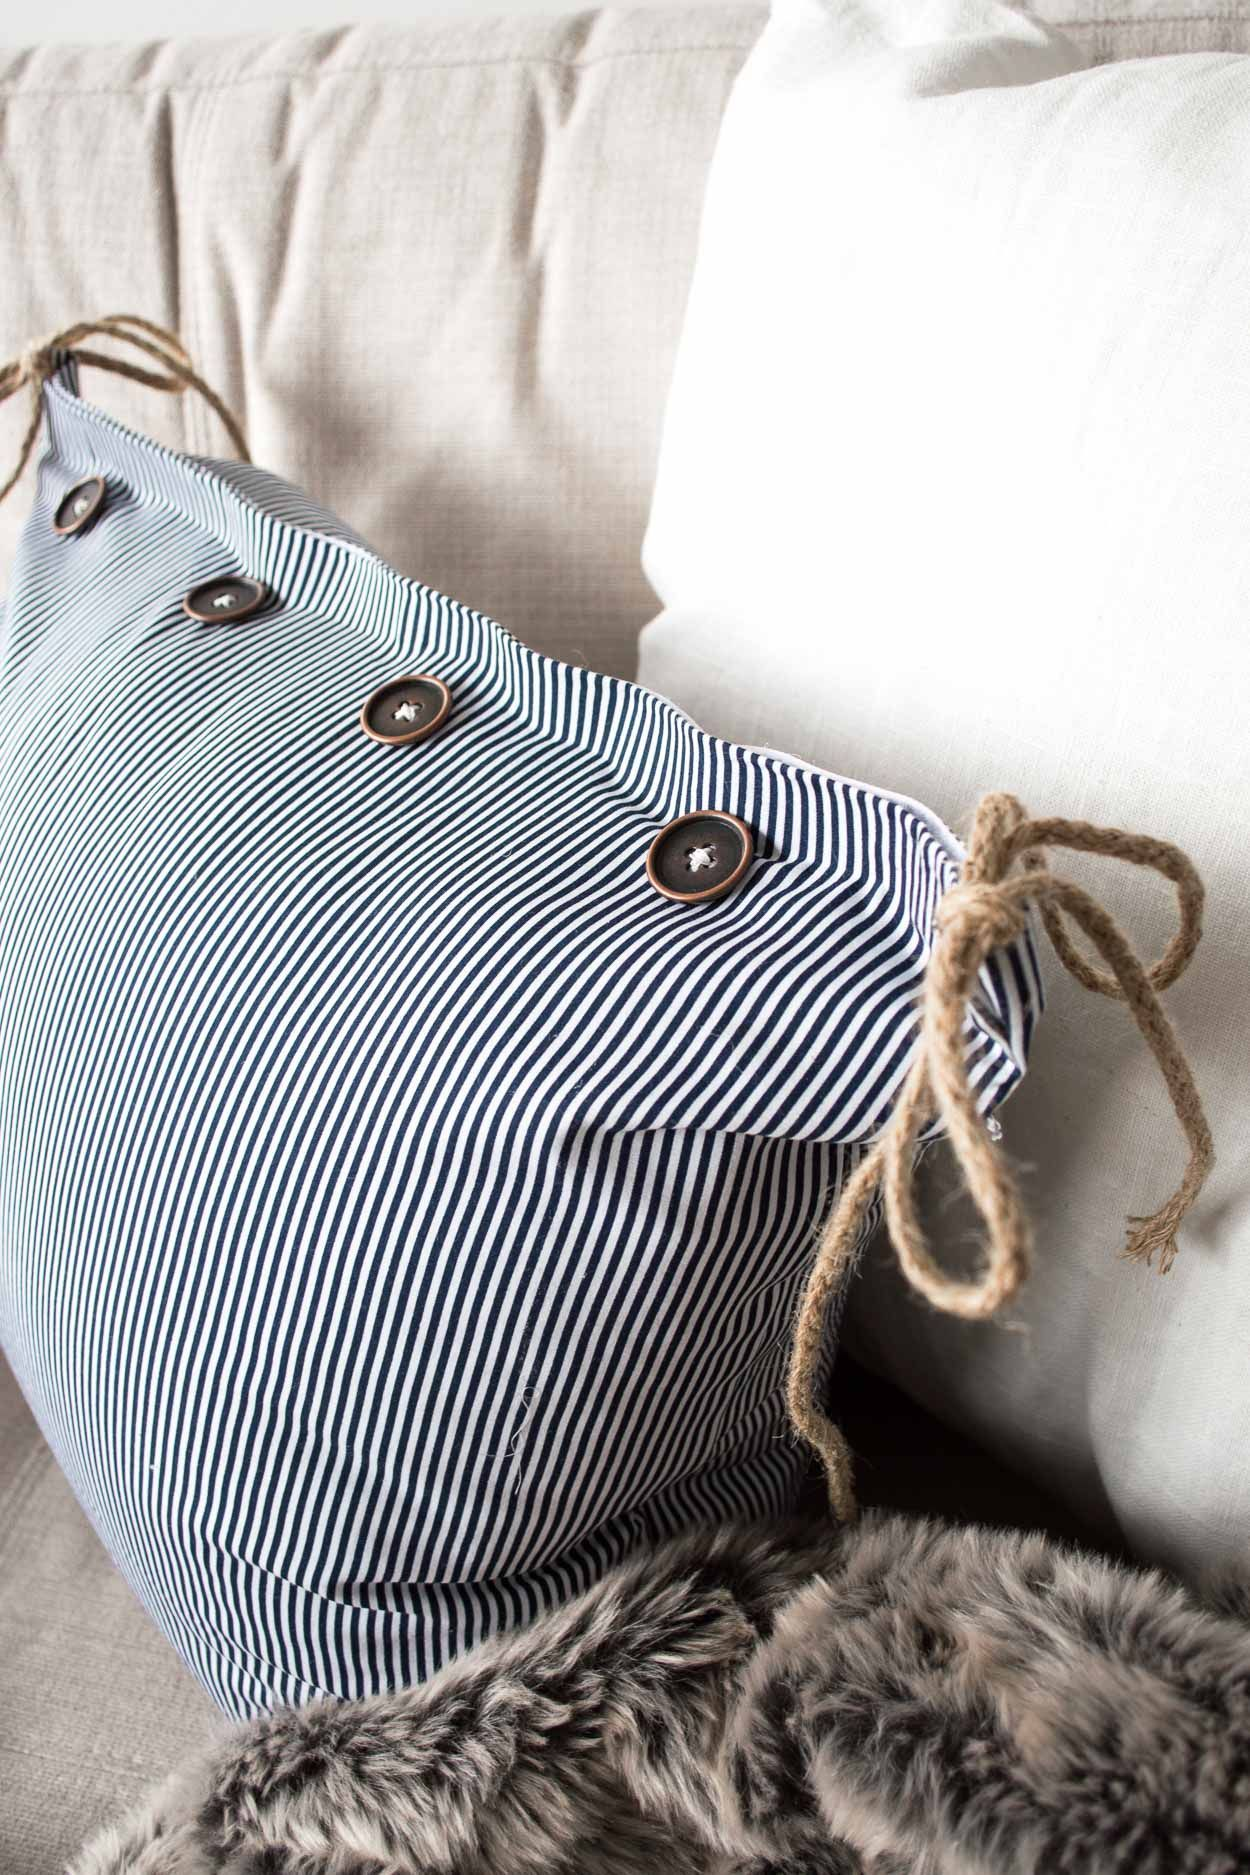 10 Awe Inspiring Make A Pillow Or Cushion Ideas Sewing Pillows Diy Cushion Covers Outdoor Furniture Cushions